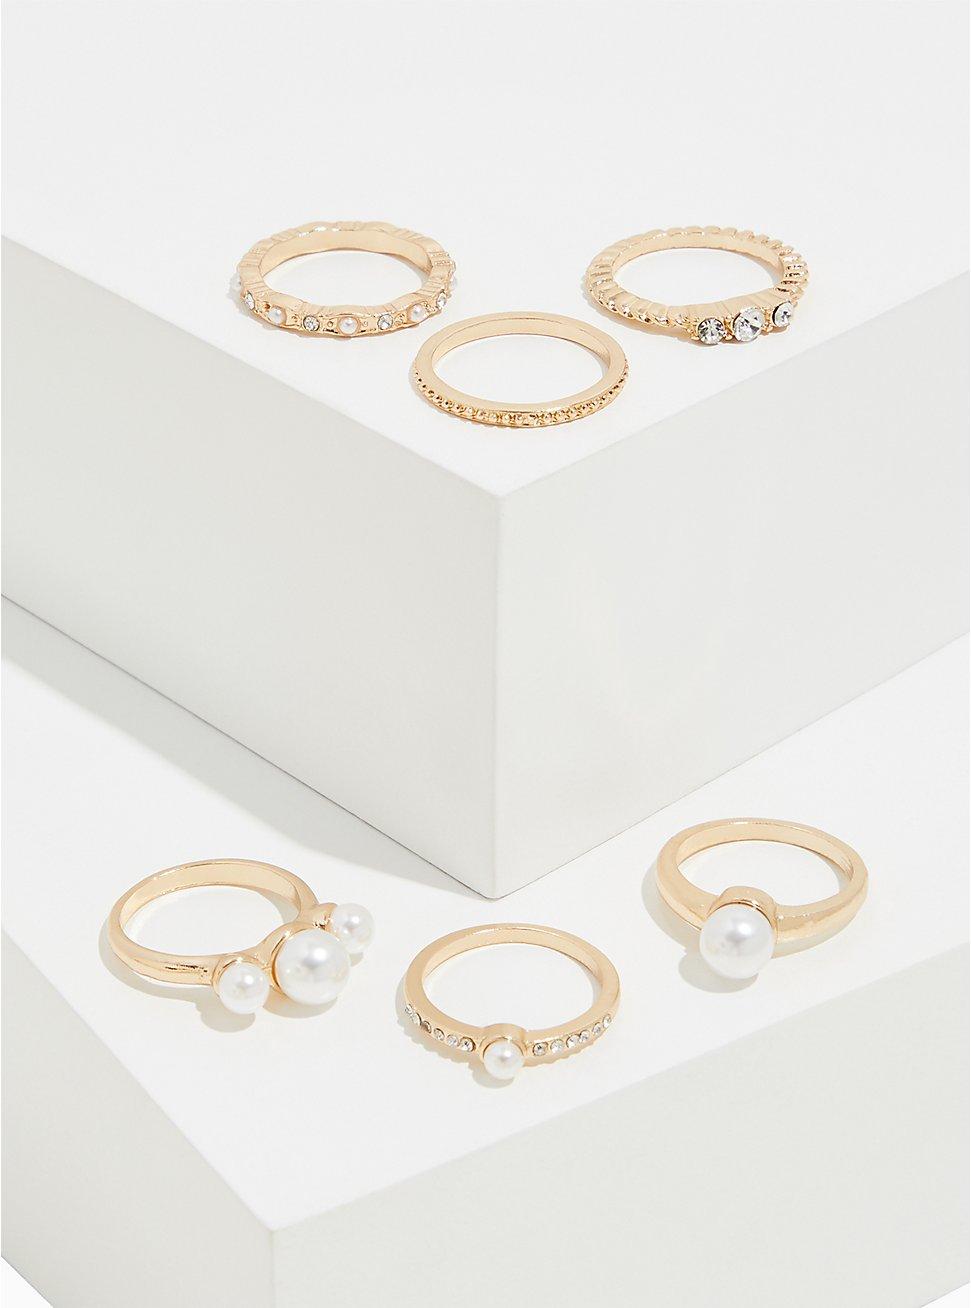 Gold-Tone Faux Pearl Ring Set - Set of 6, GOLD, hi-res